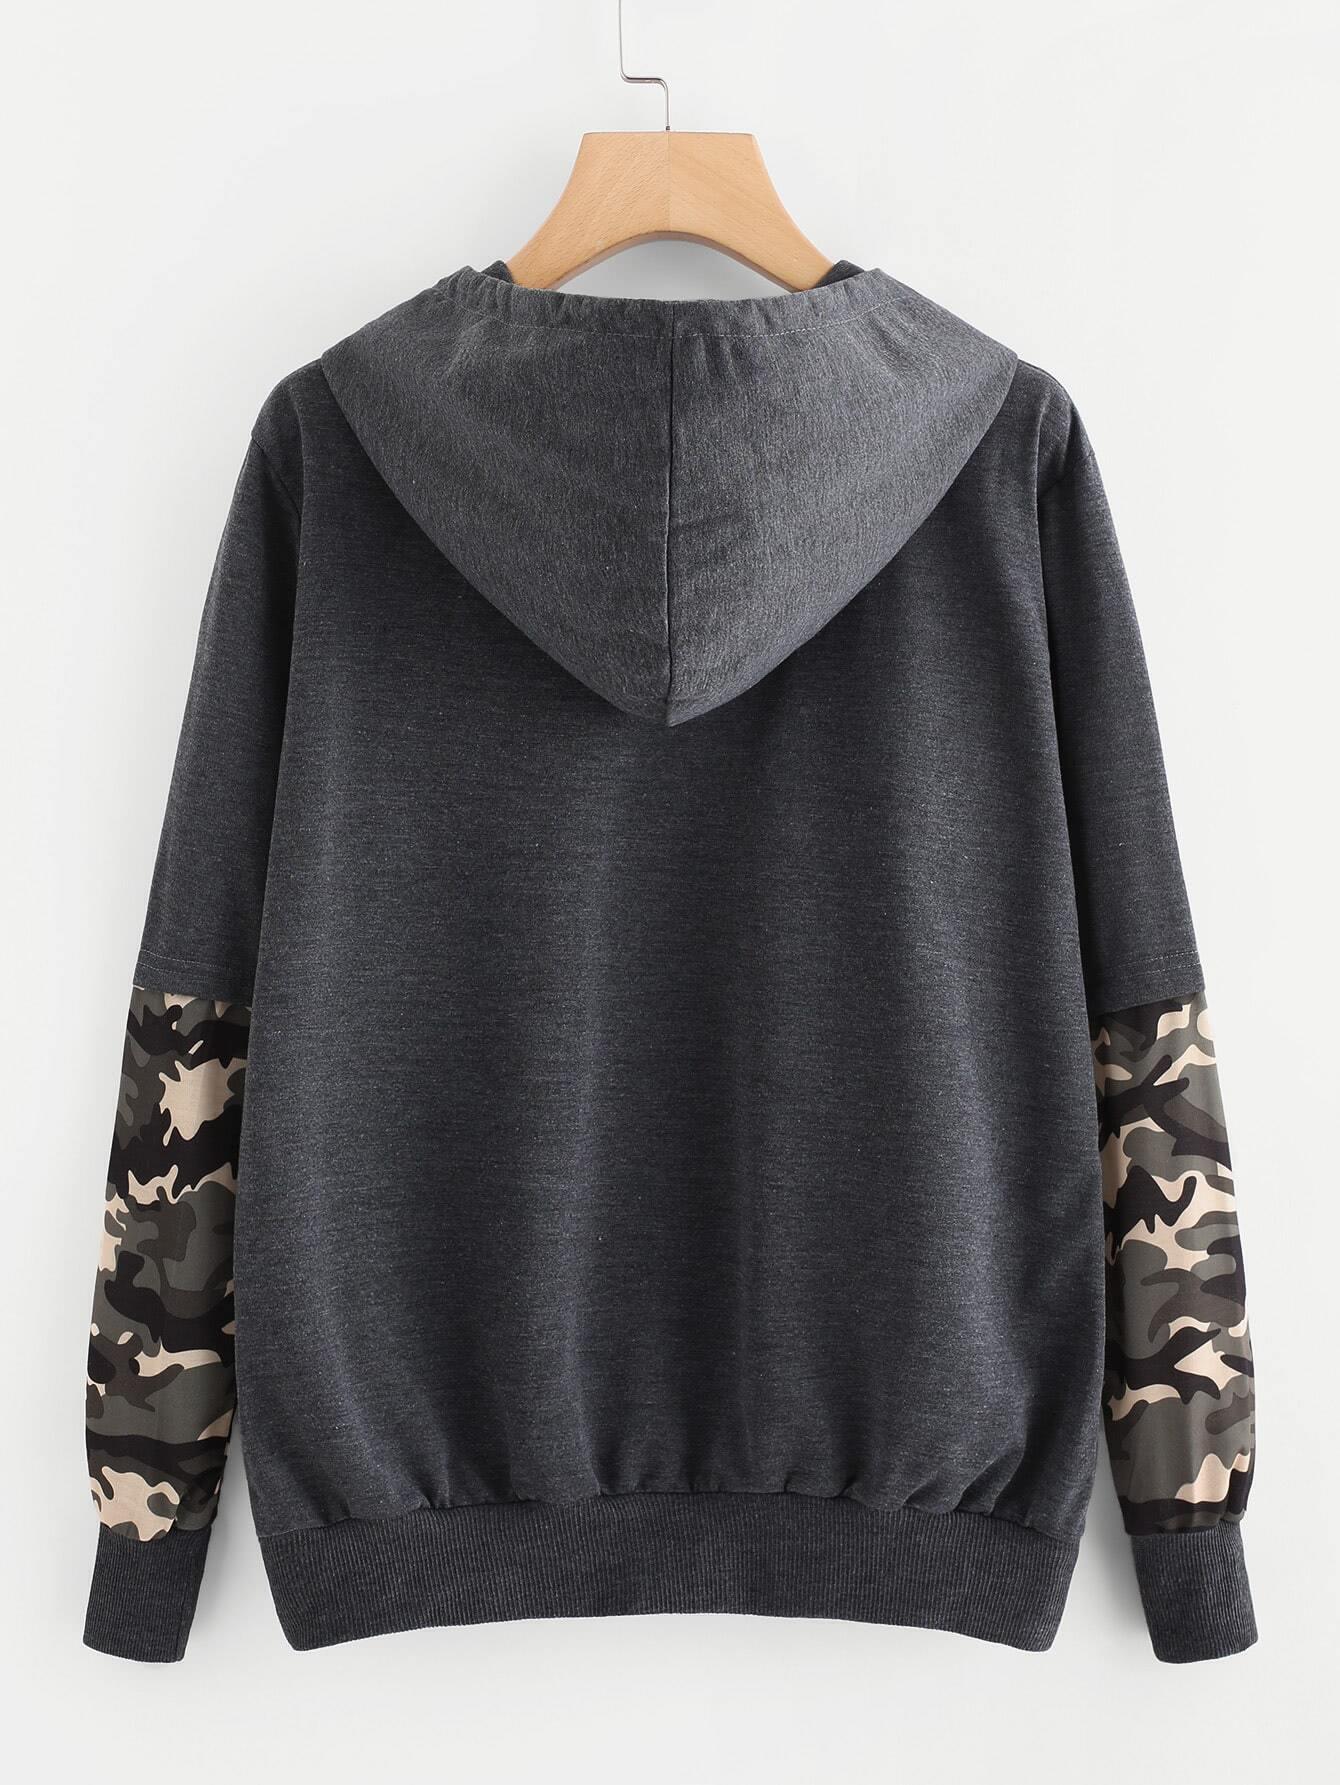 Cat Camouflage Hooded Sweatshirts